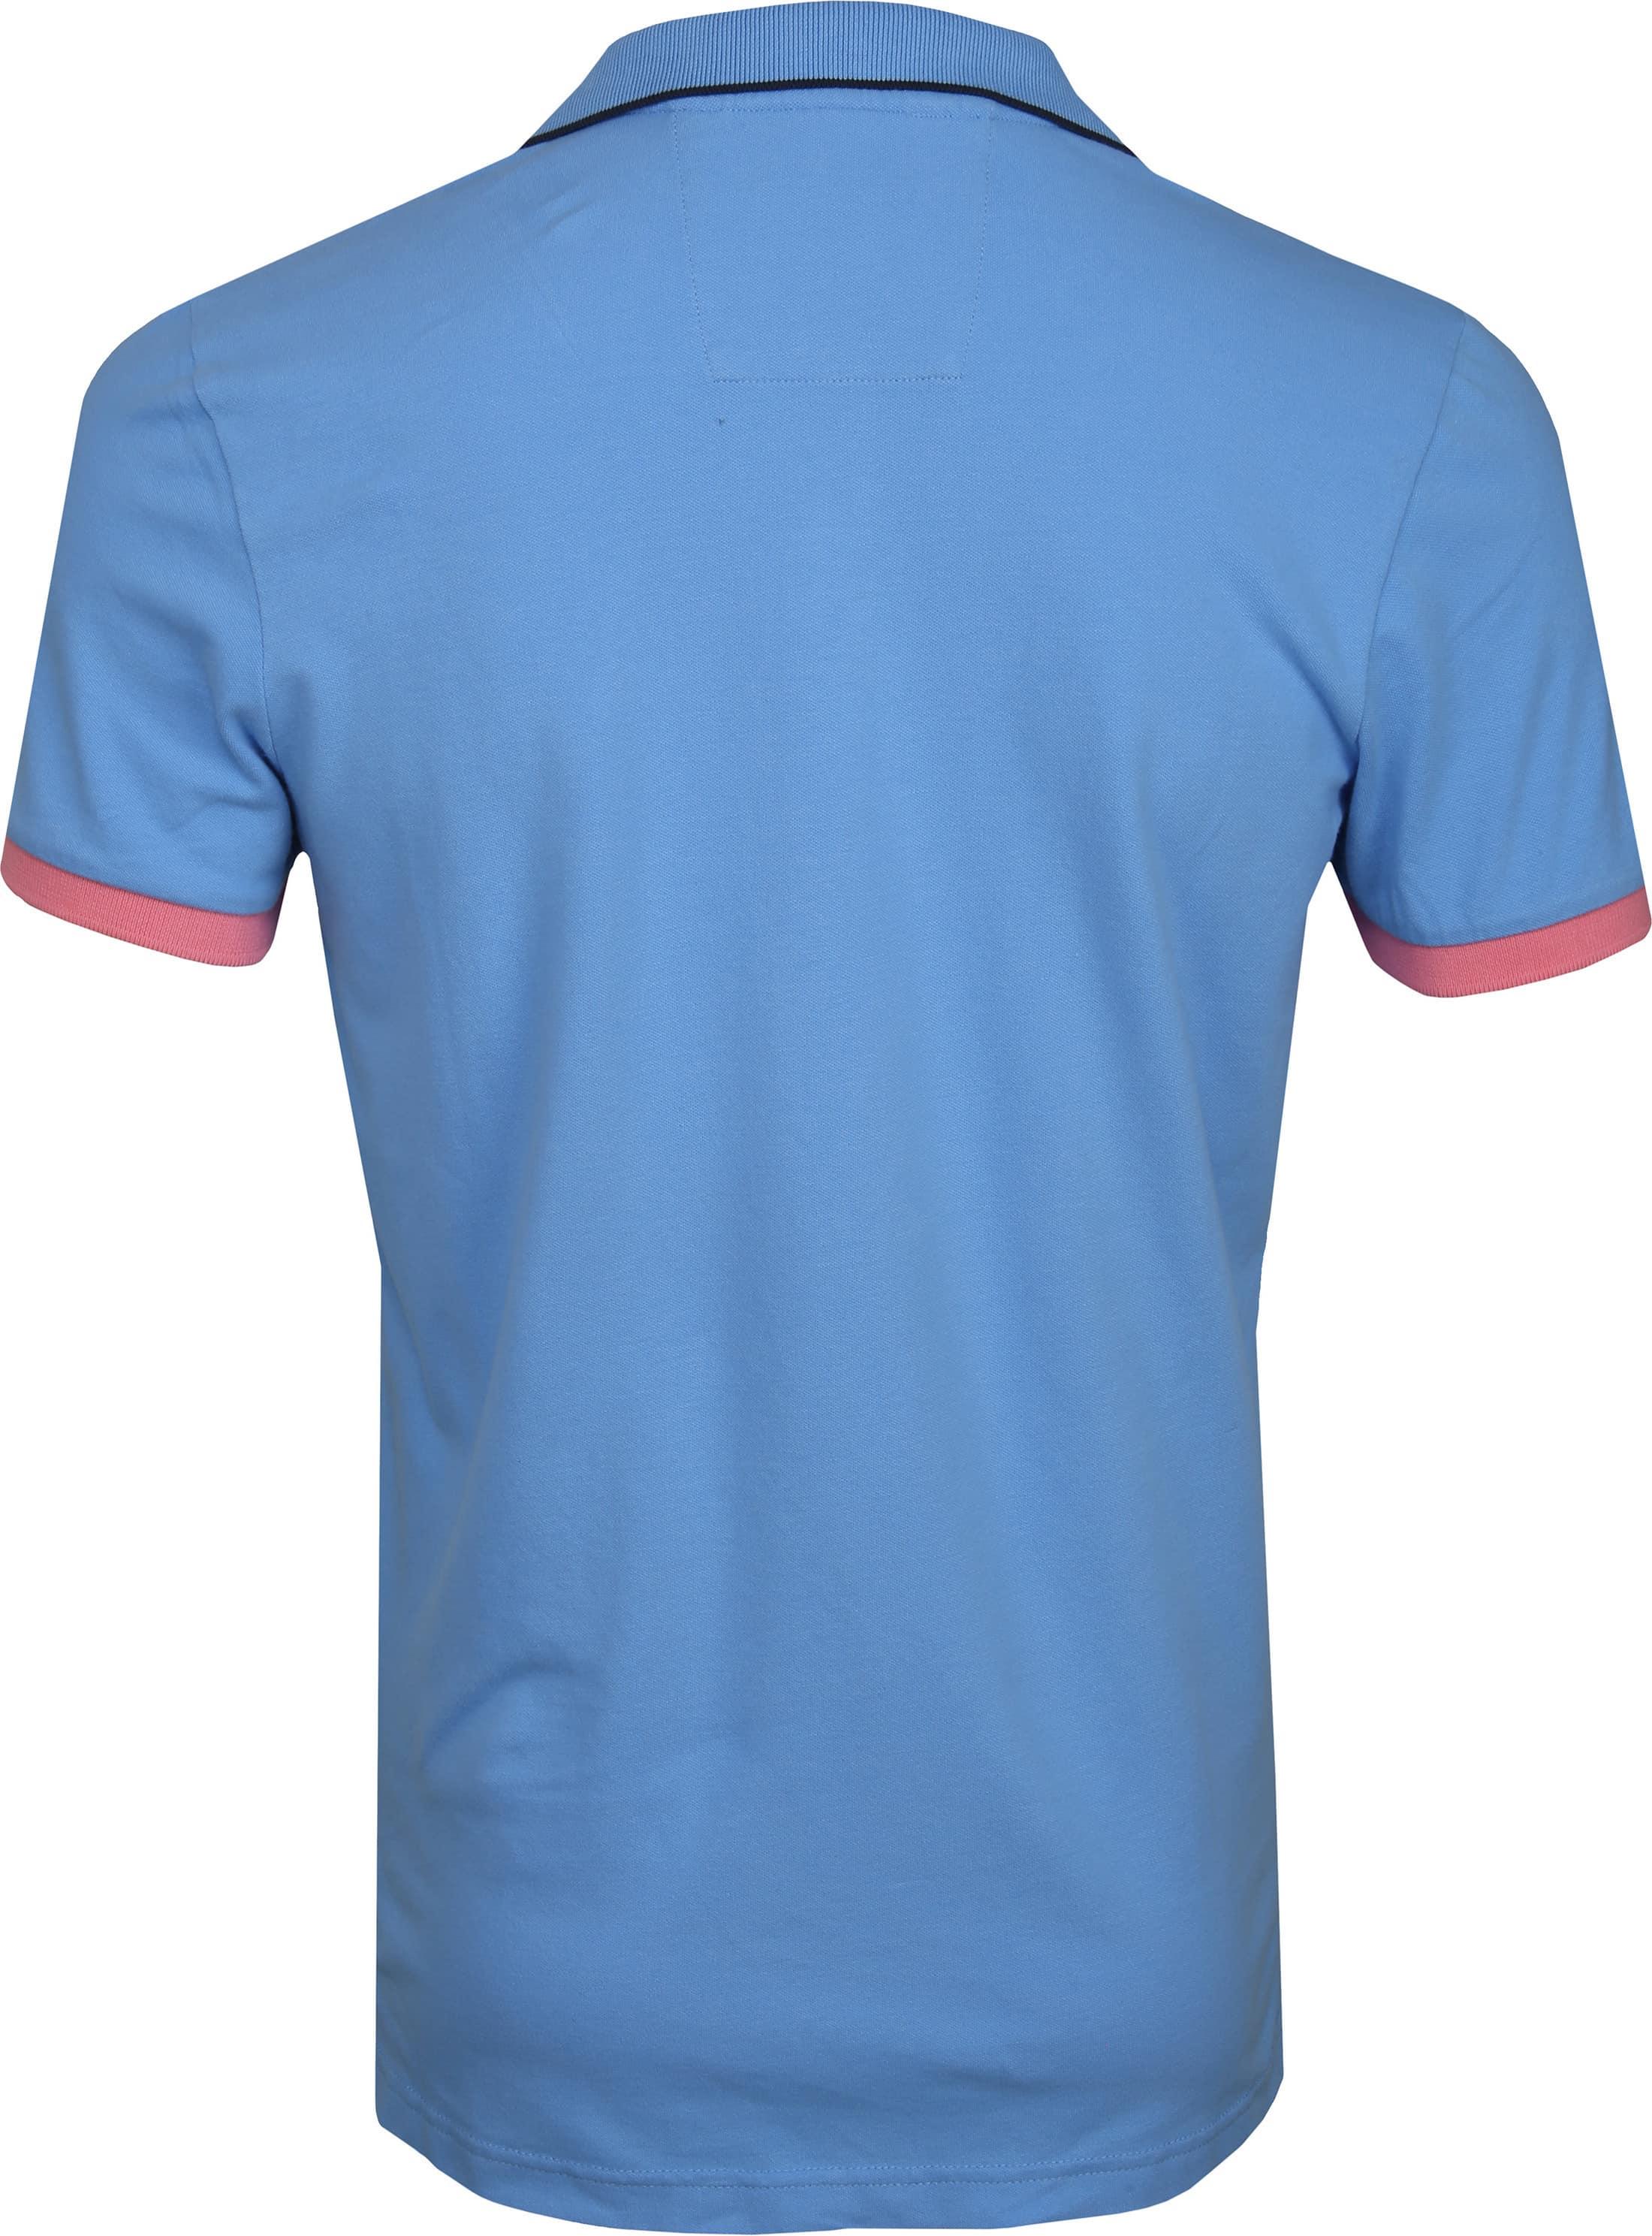 NZA Wahapo Poloshirt Blauw foto 3